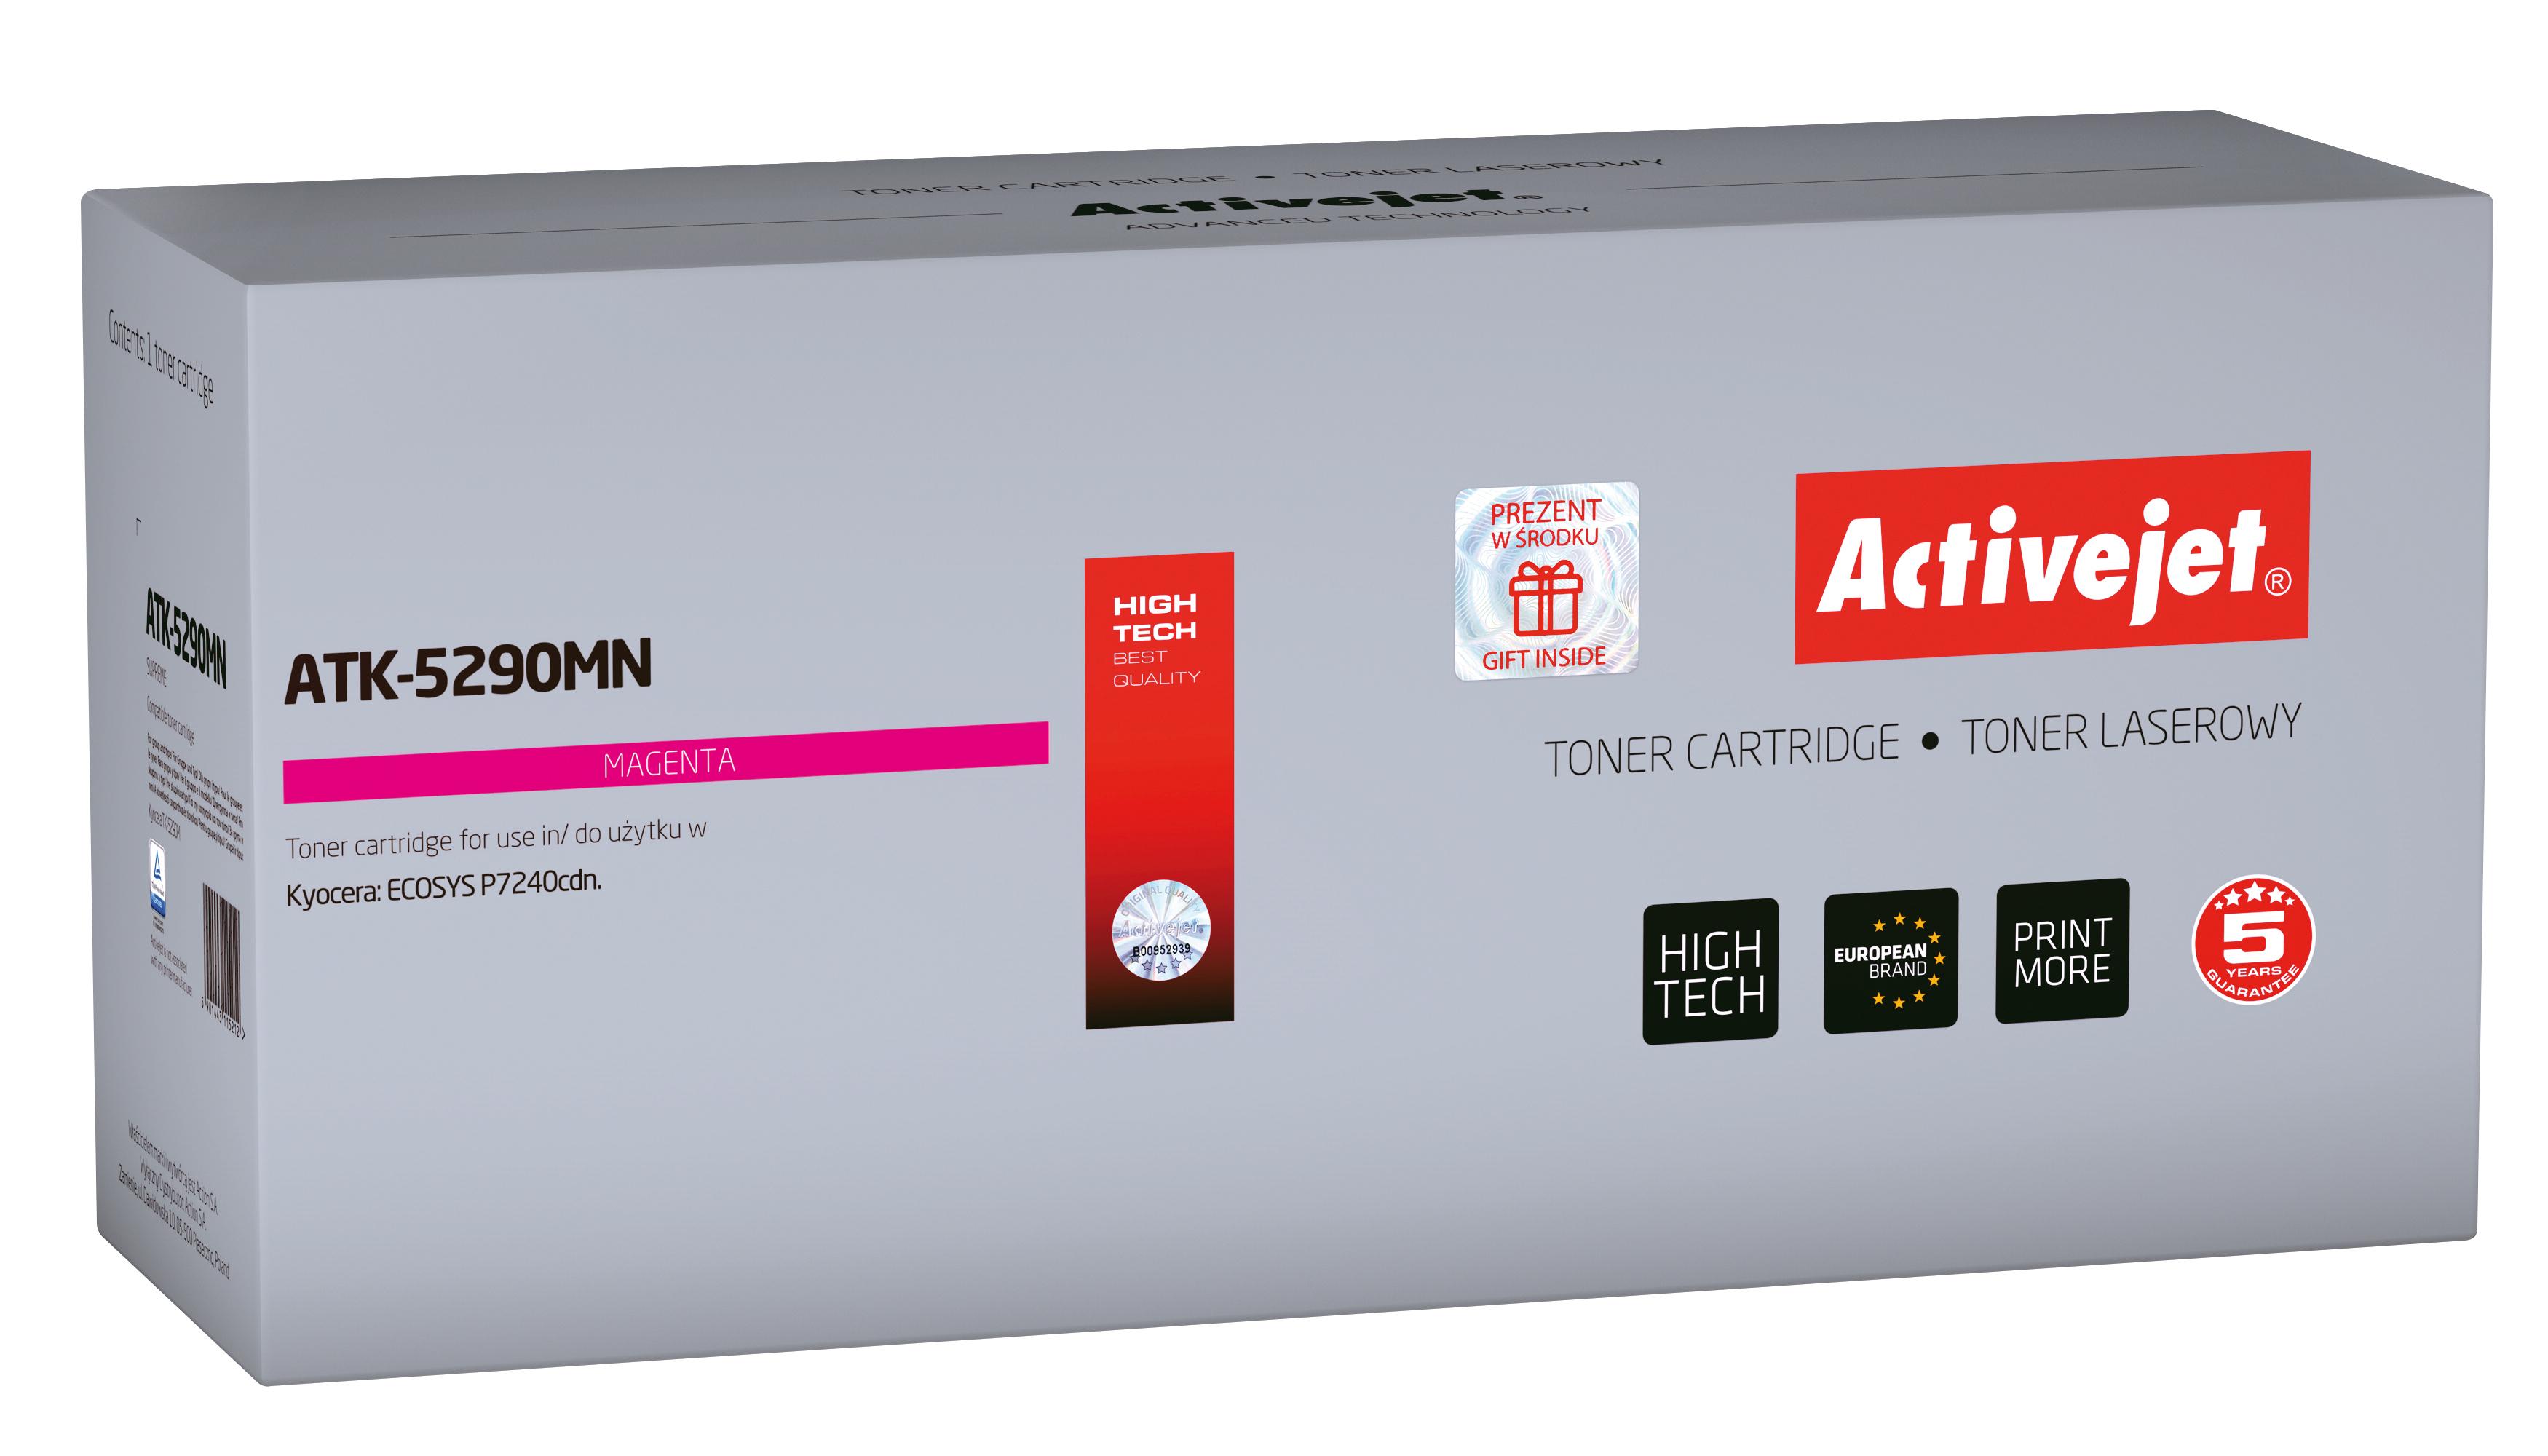 Toner Activejet  ATK-5290MN do drukarki Kyocera, Zamiennik Kyocera TK-5290M; Supreme; 13000 stron; Purpurowy.